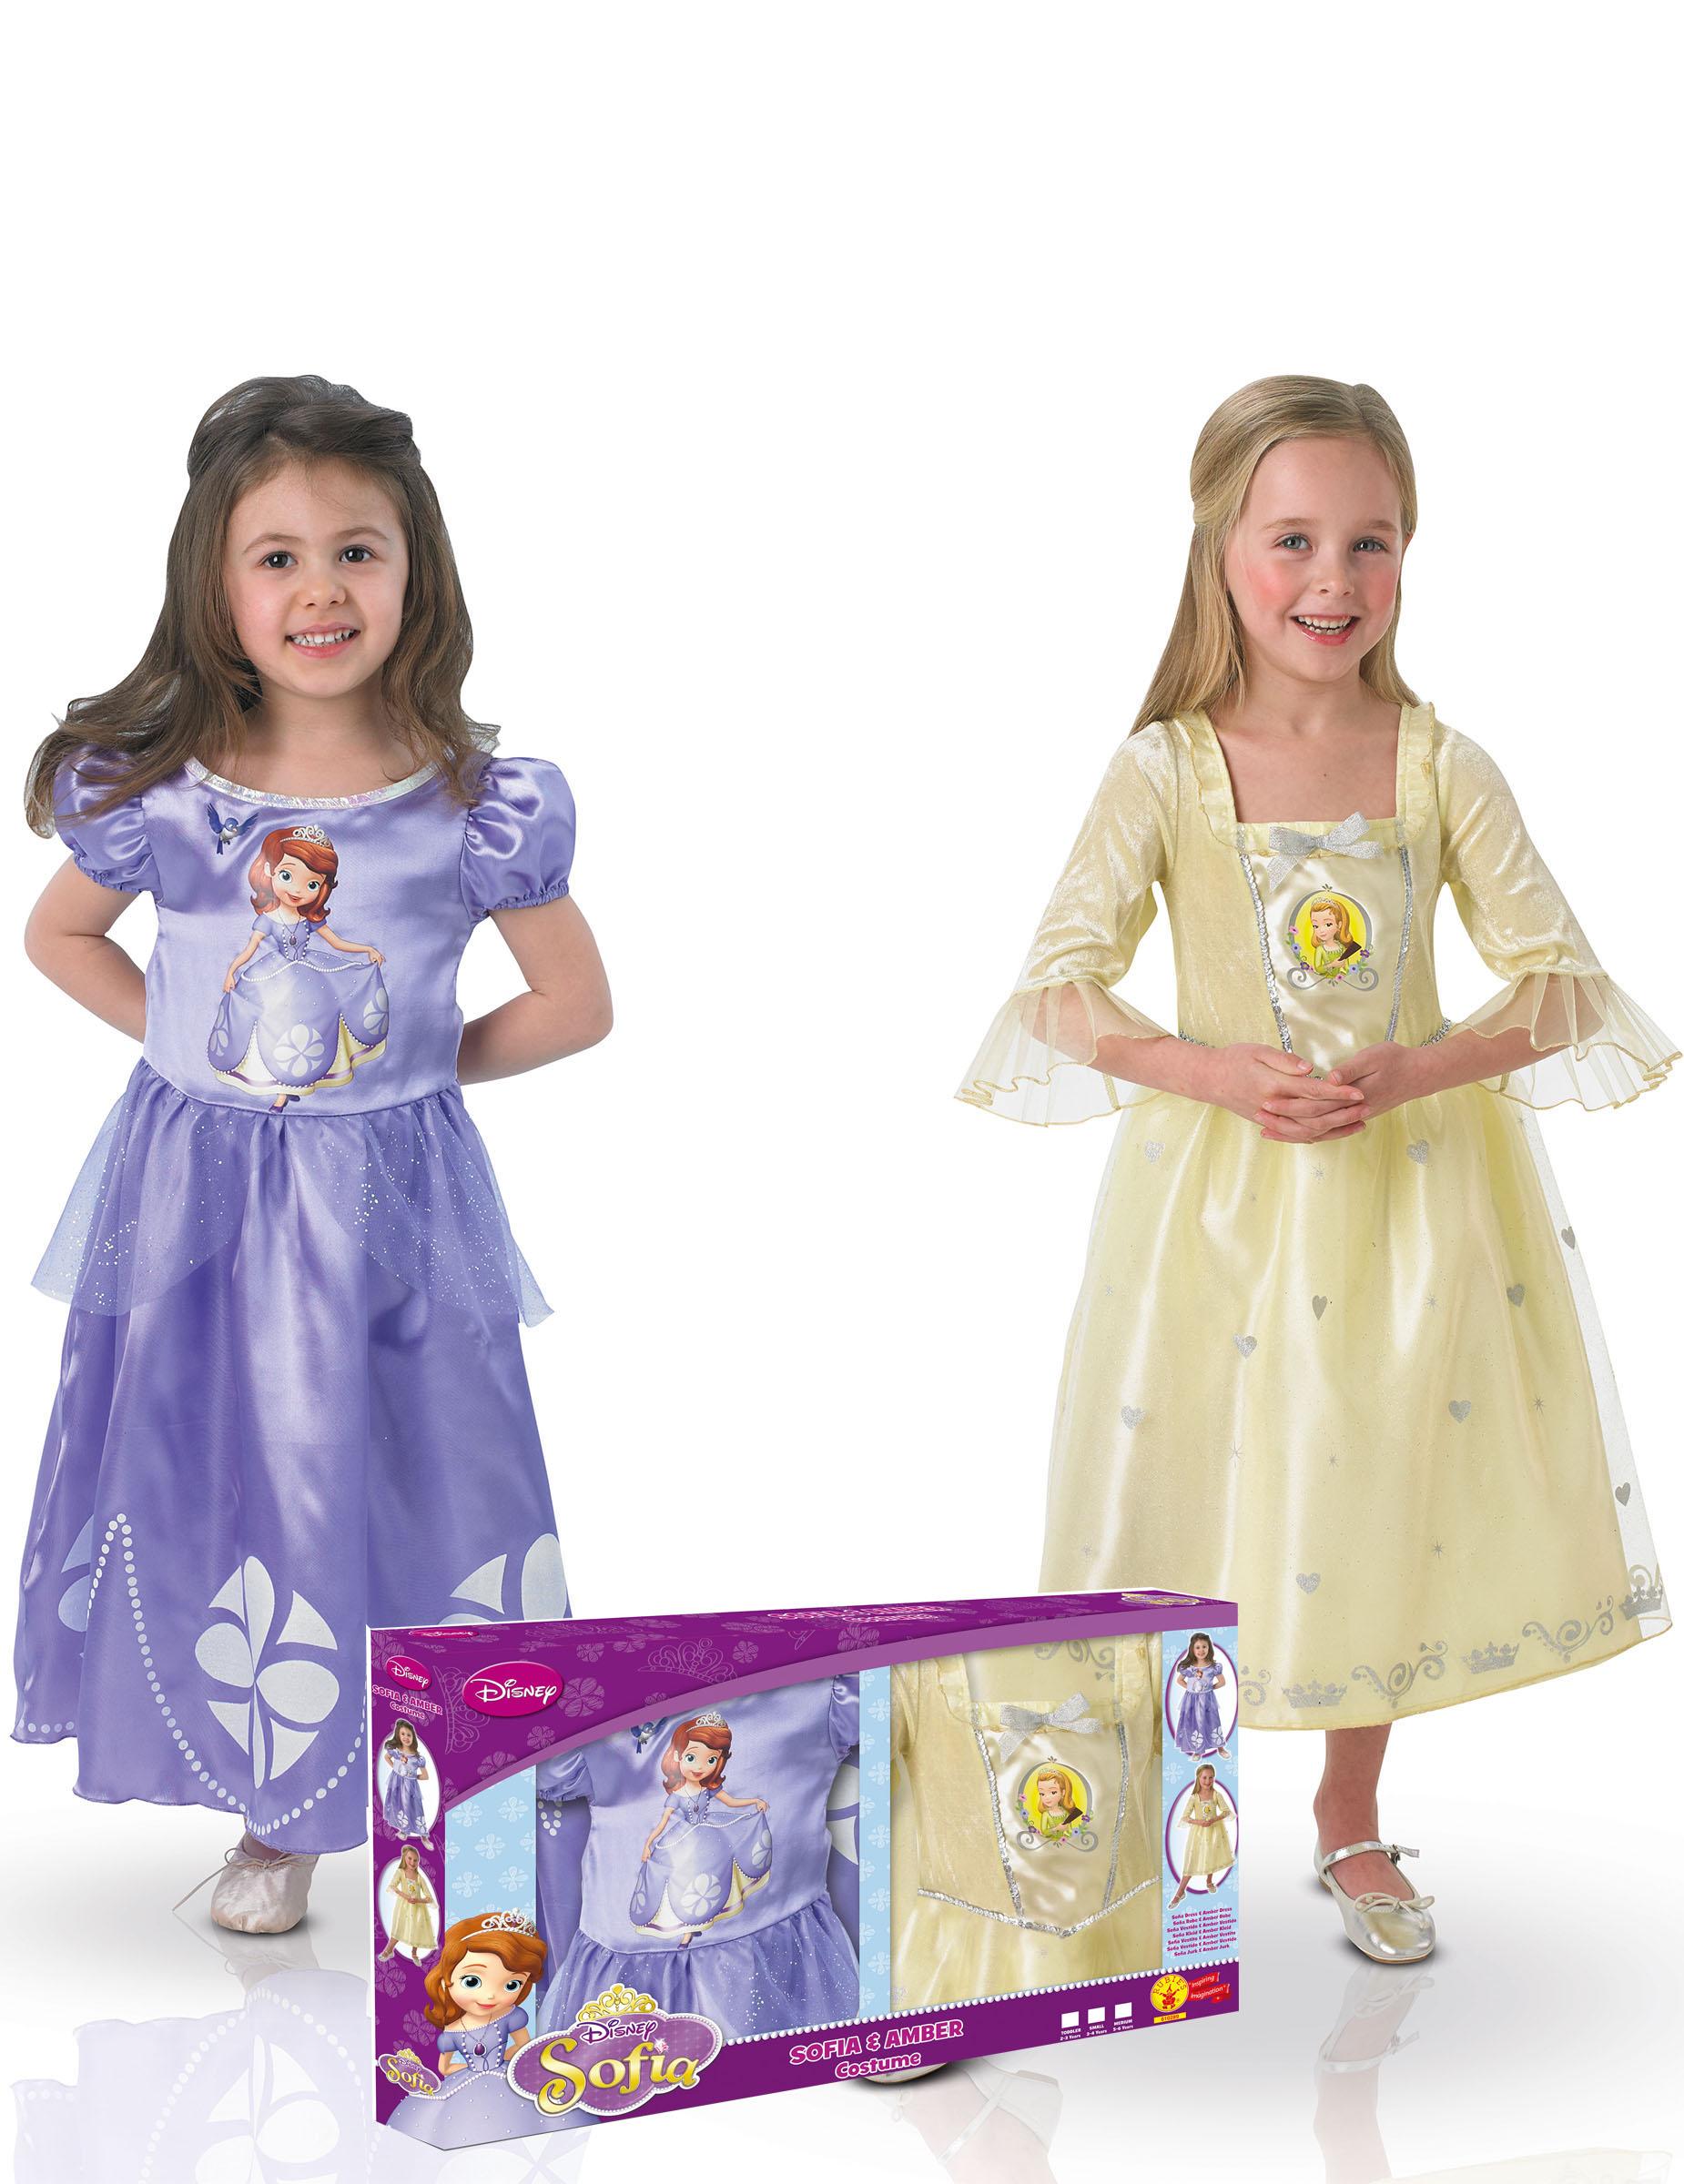 prinsesse sofia kjole